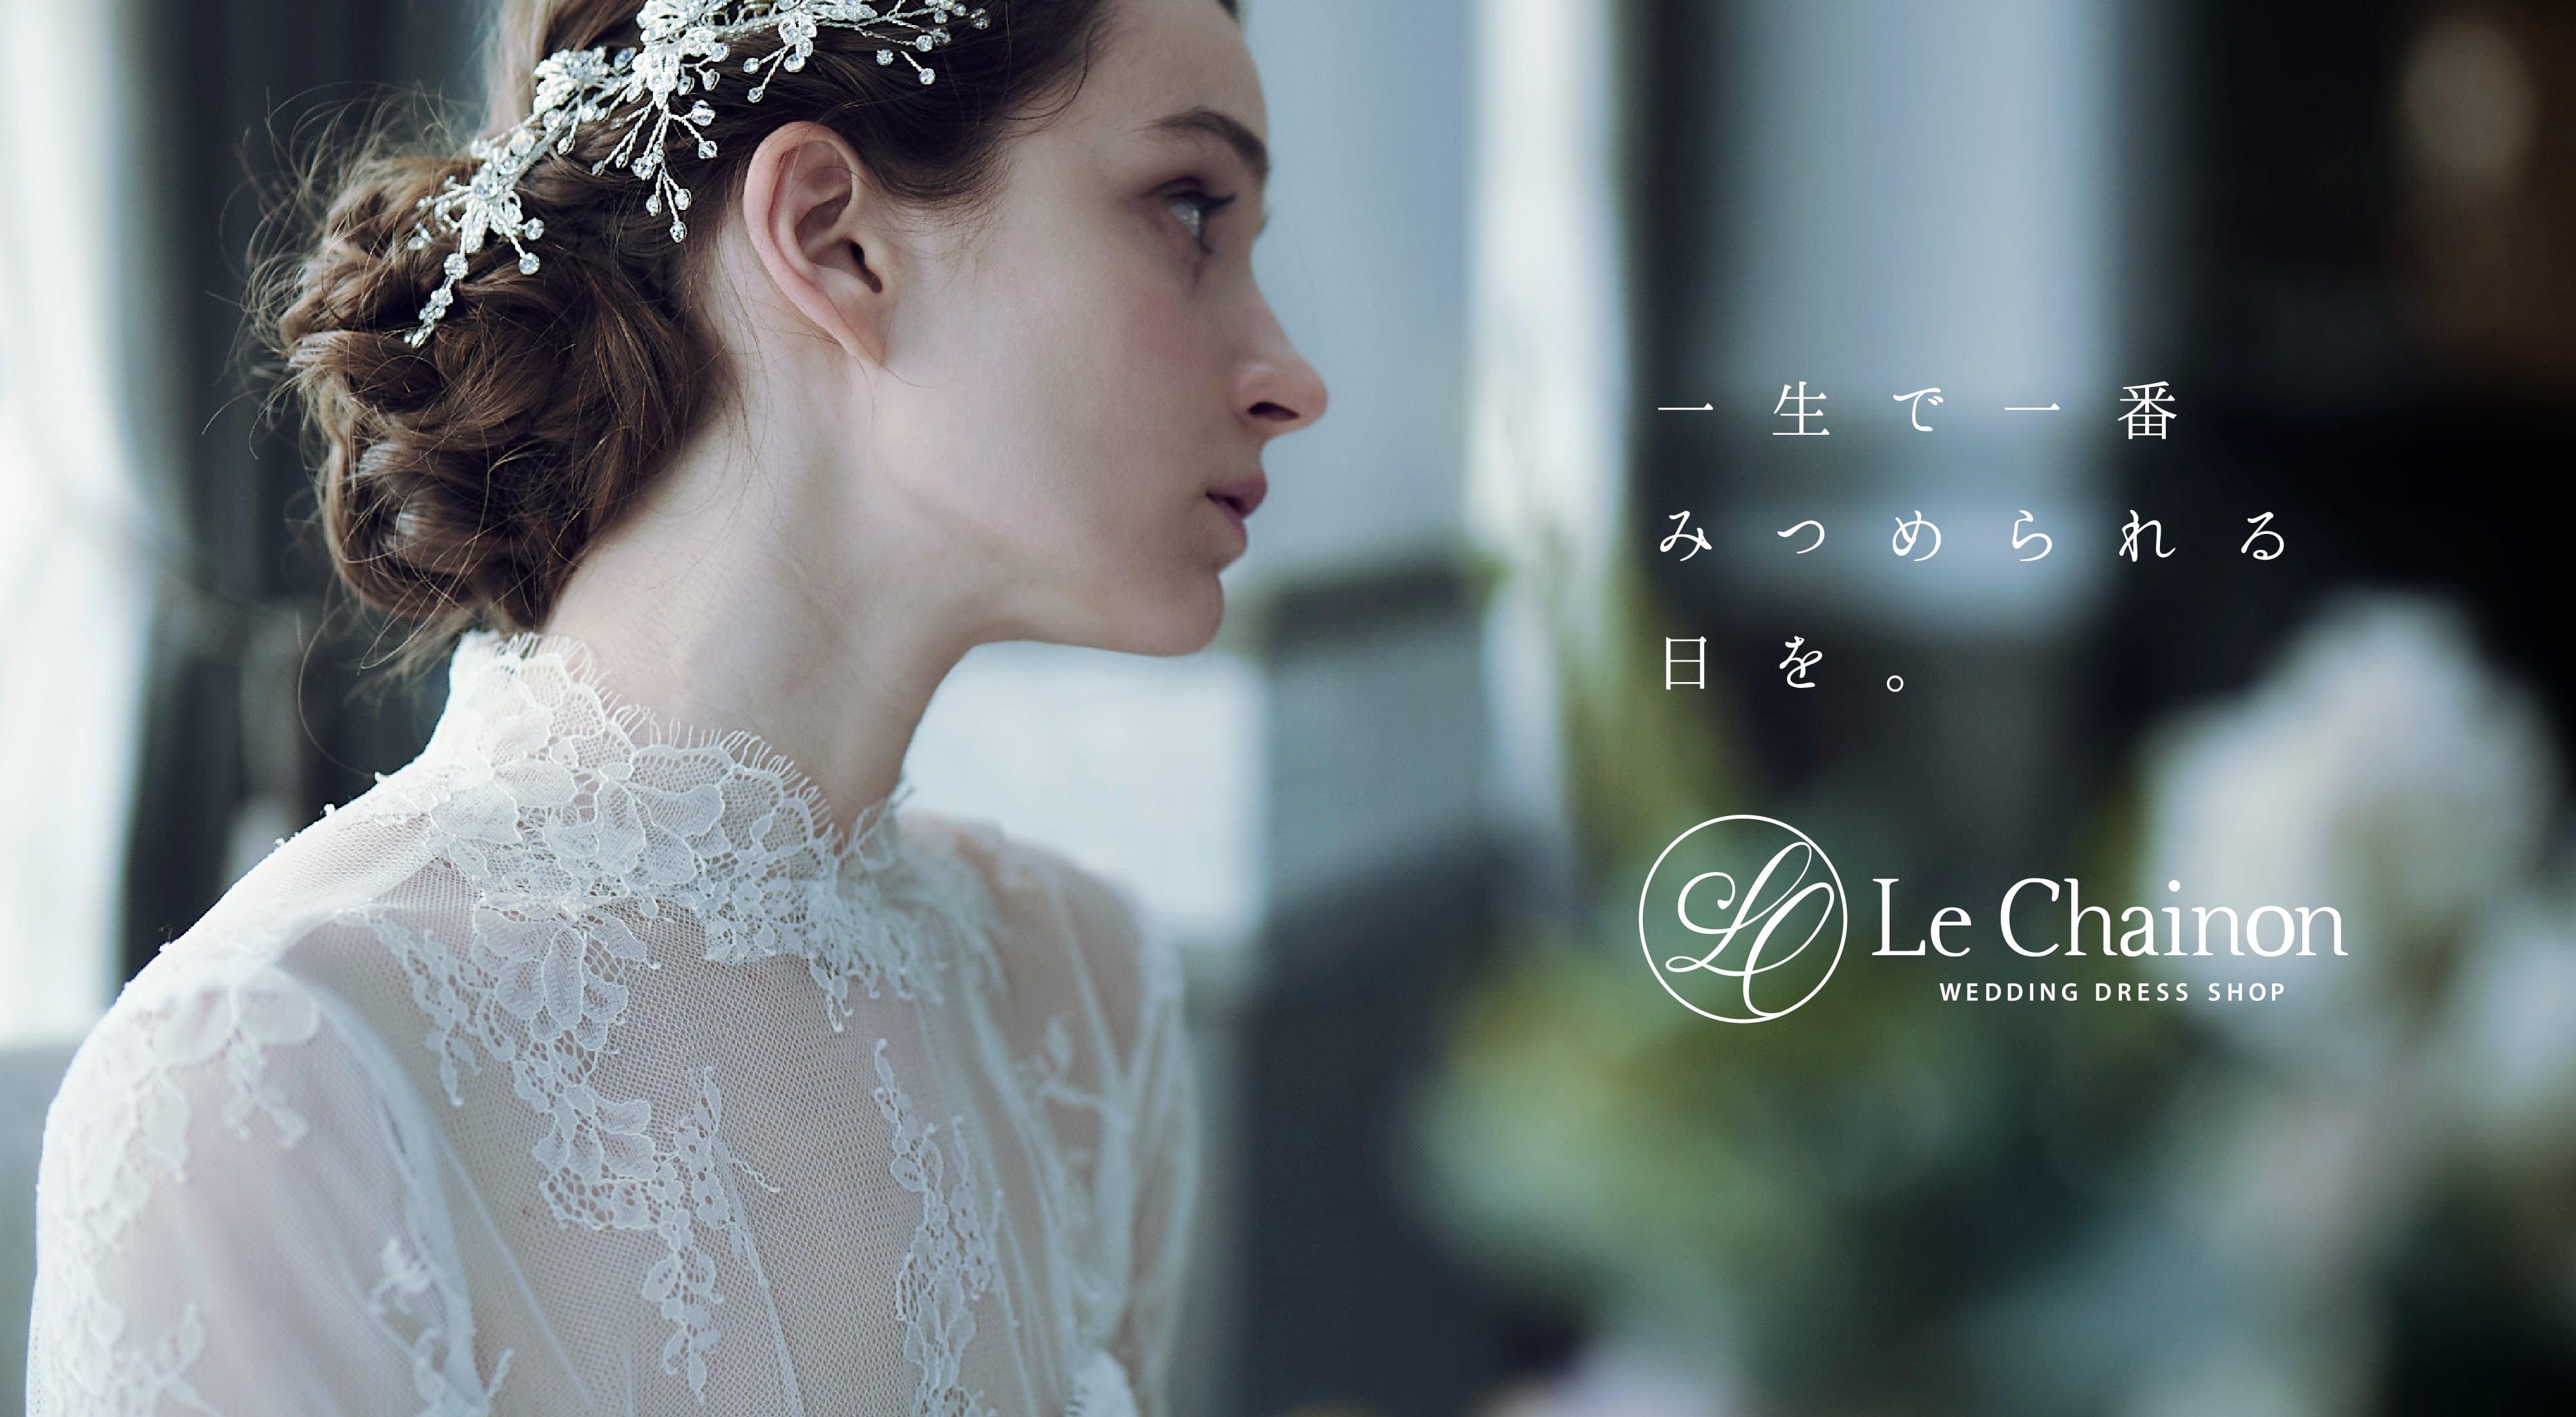 Le Chainon WEDDING DRESS SHOP 一生で一番みつめられる日を。